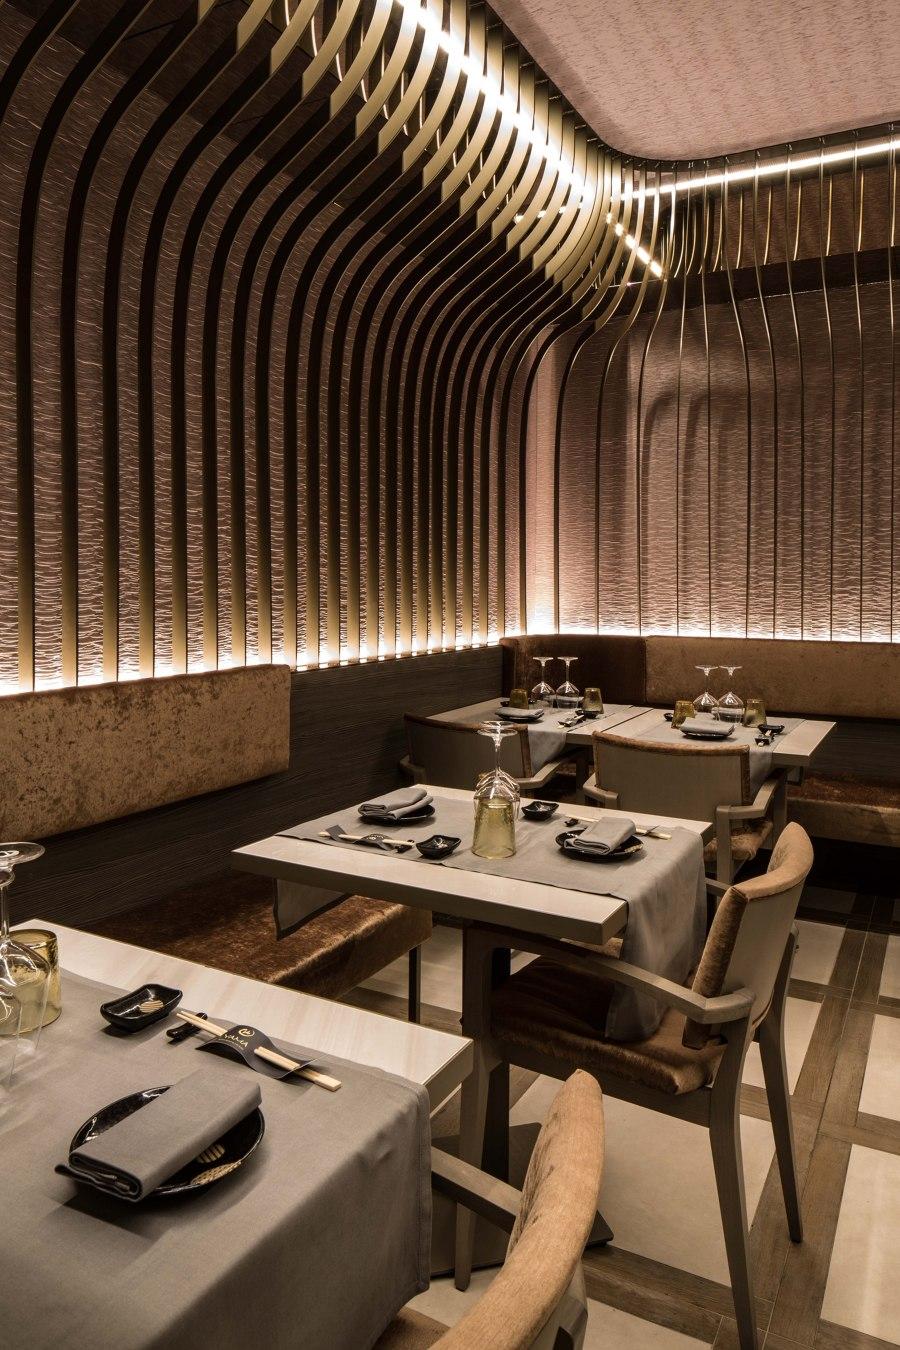 Yama by LAI STUDIO, Maurizio Lai   Restaurant interiors